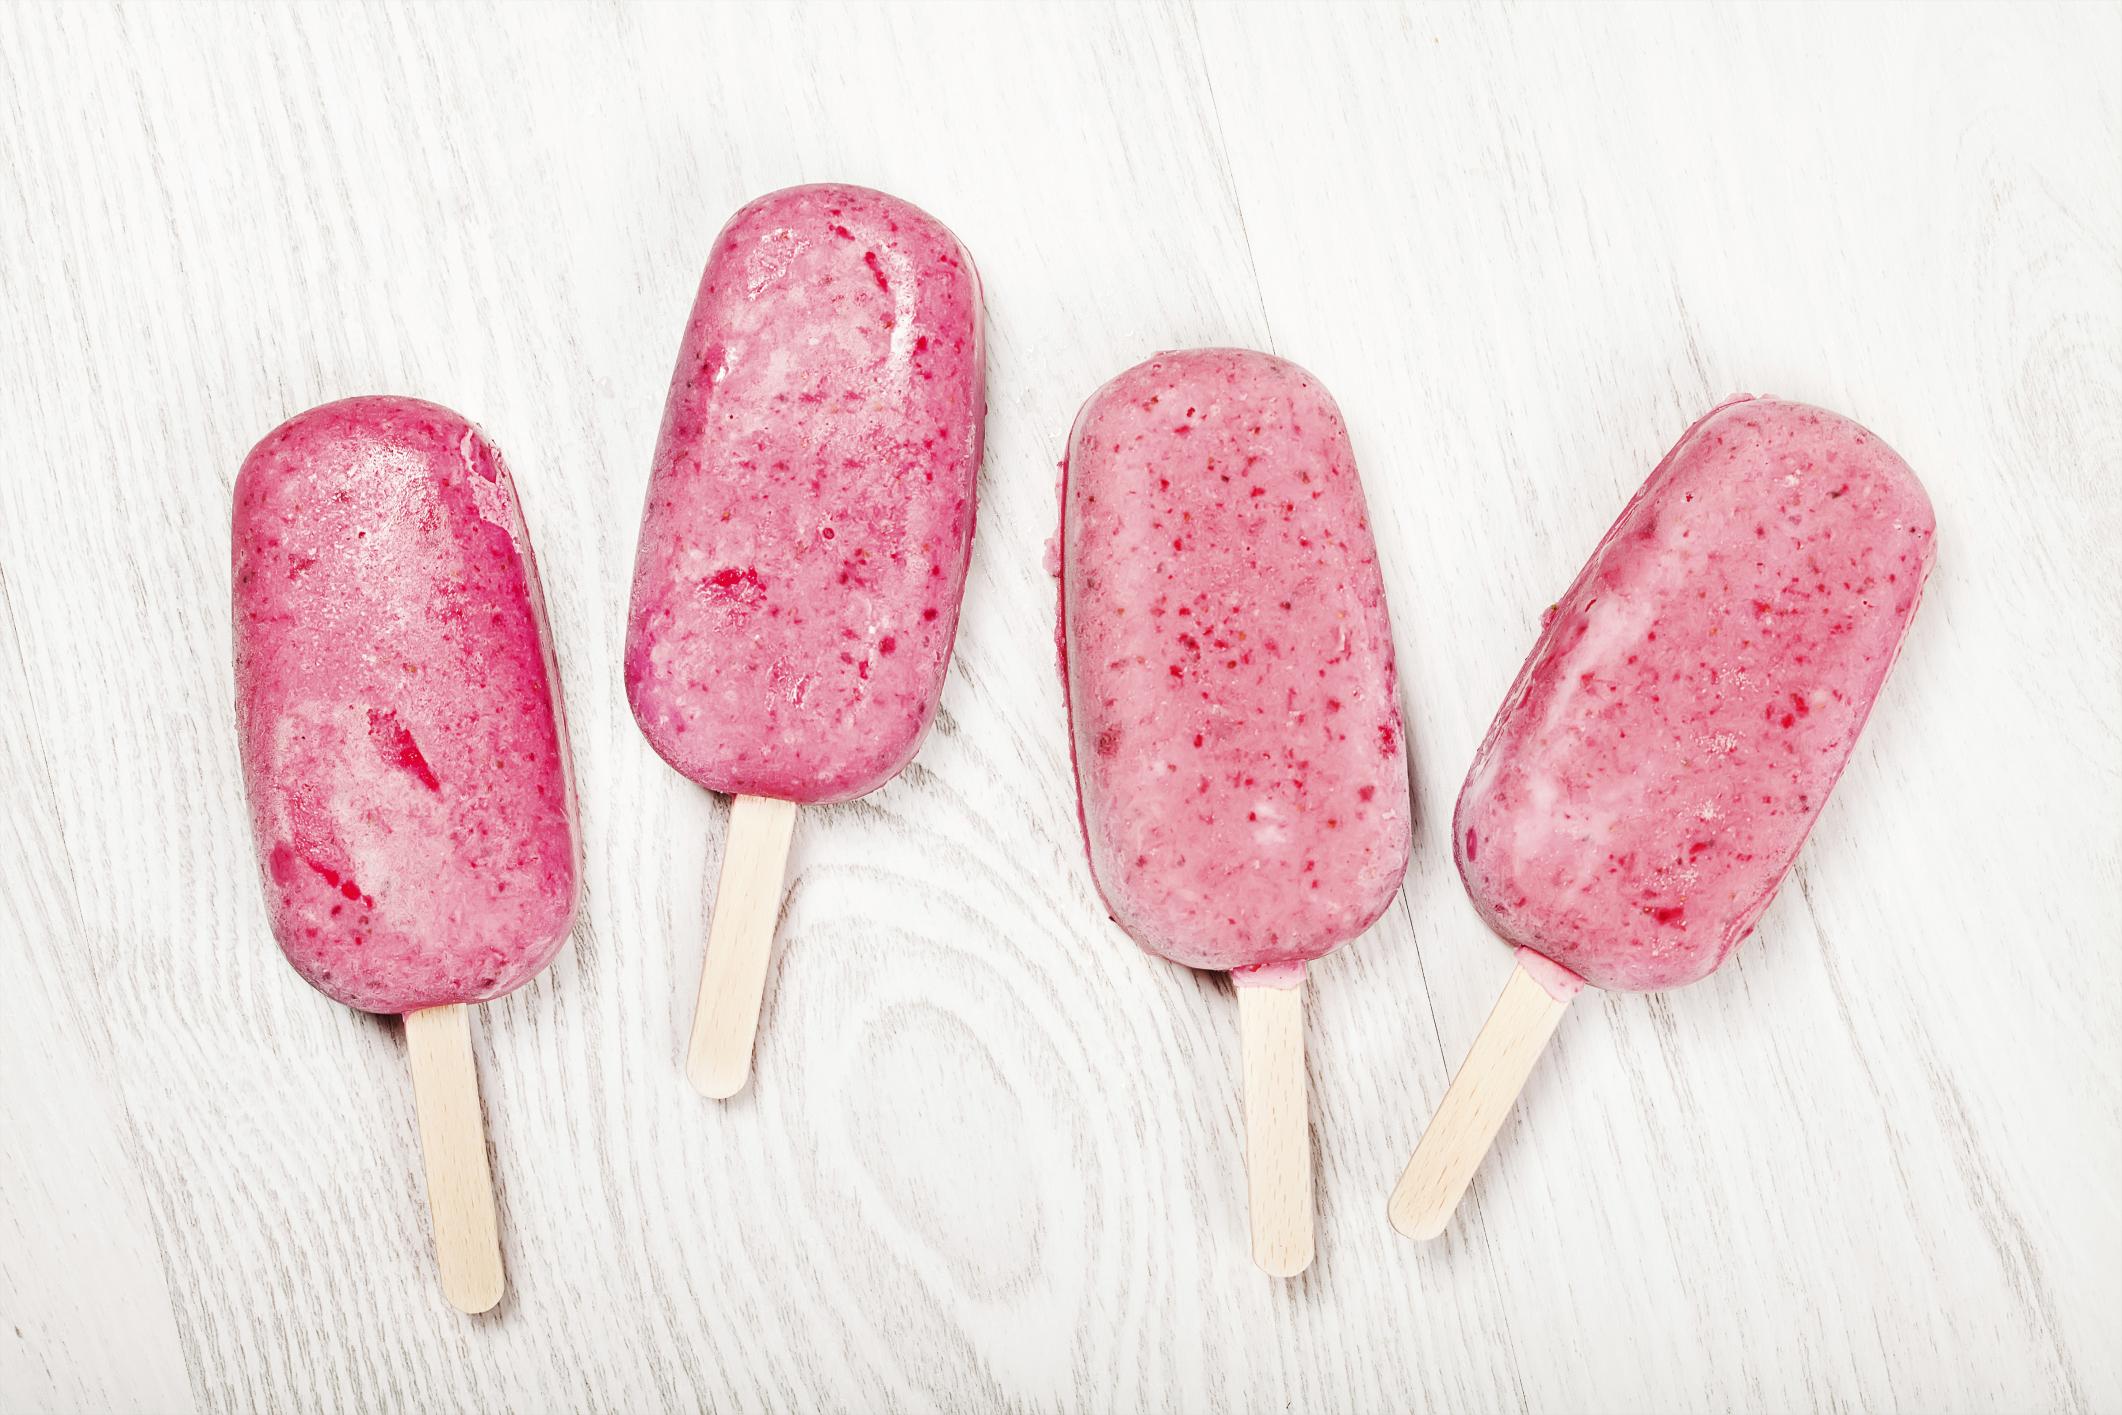 Polos de yogur y fresa